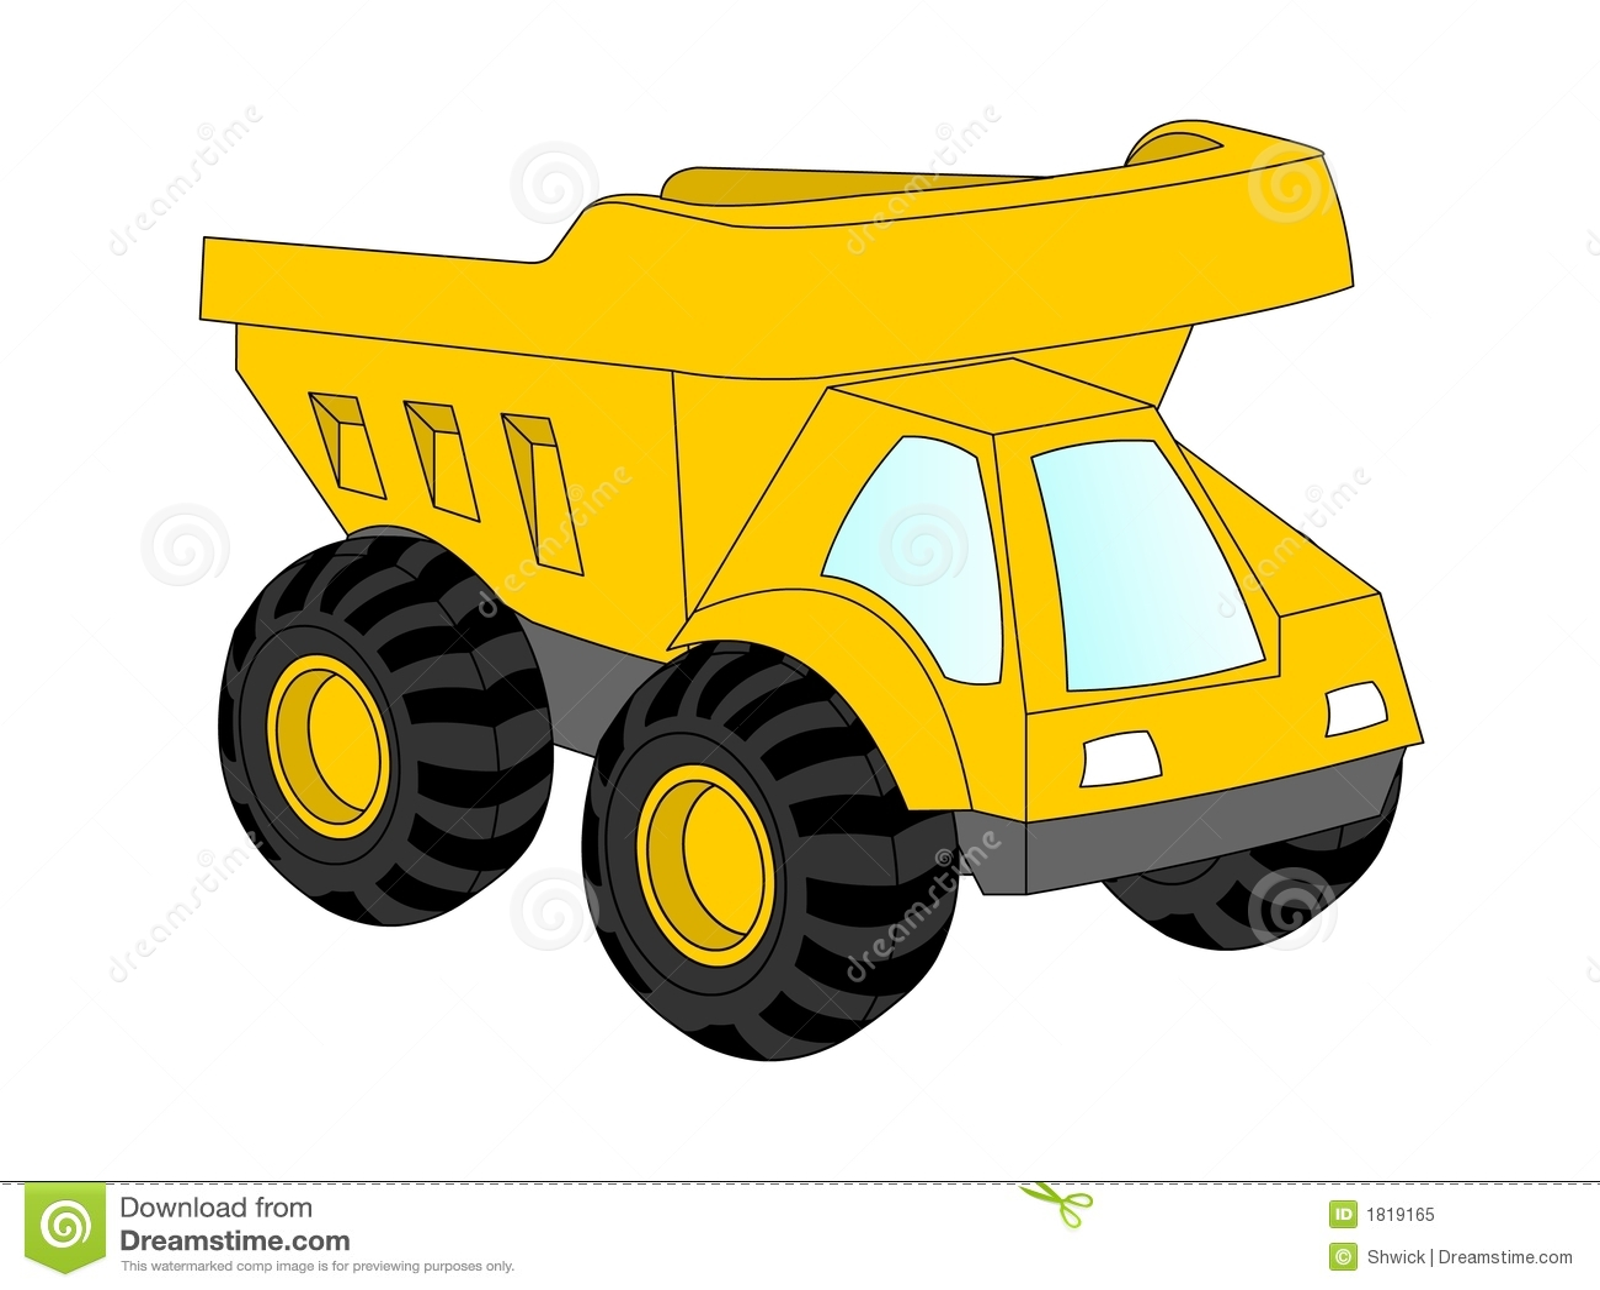 yellow truck clipart - photo #27